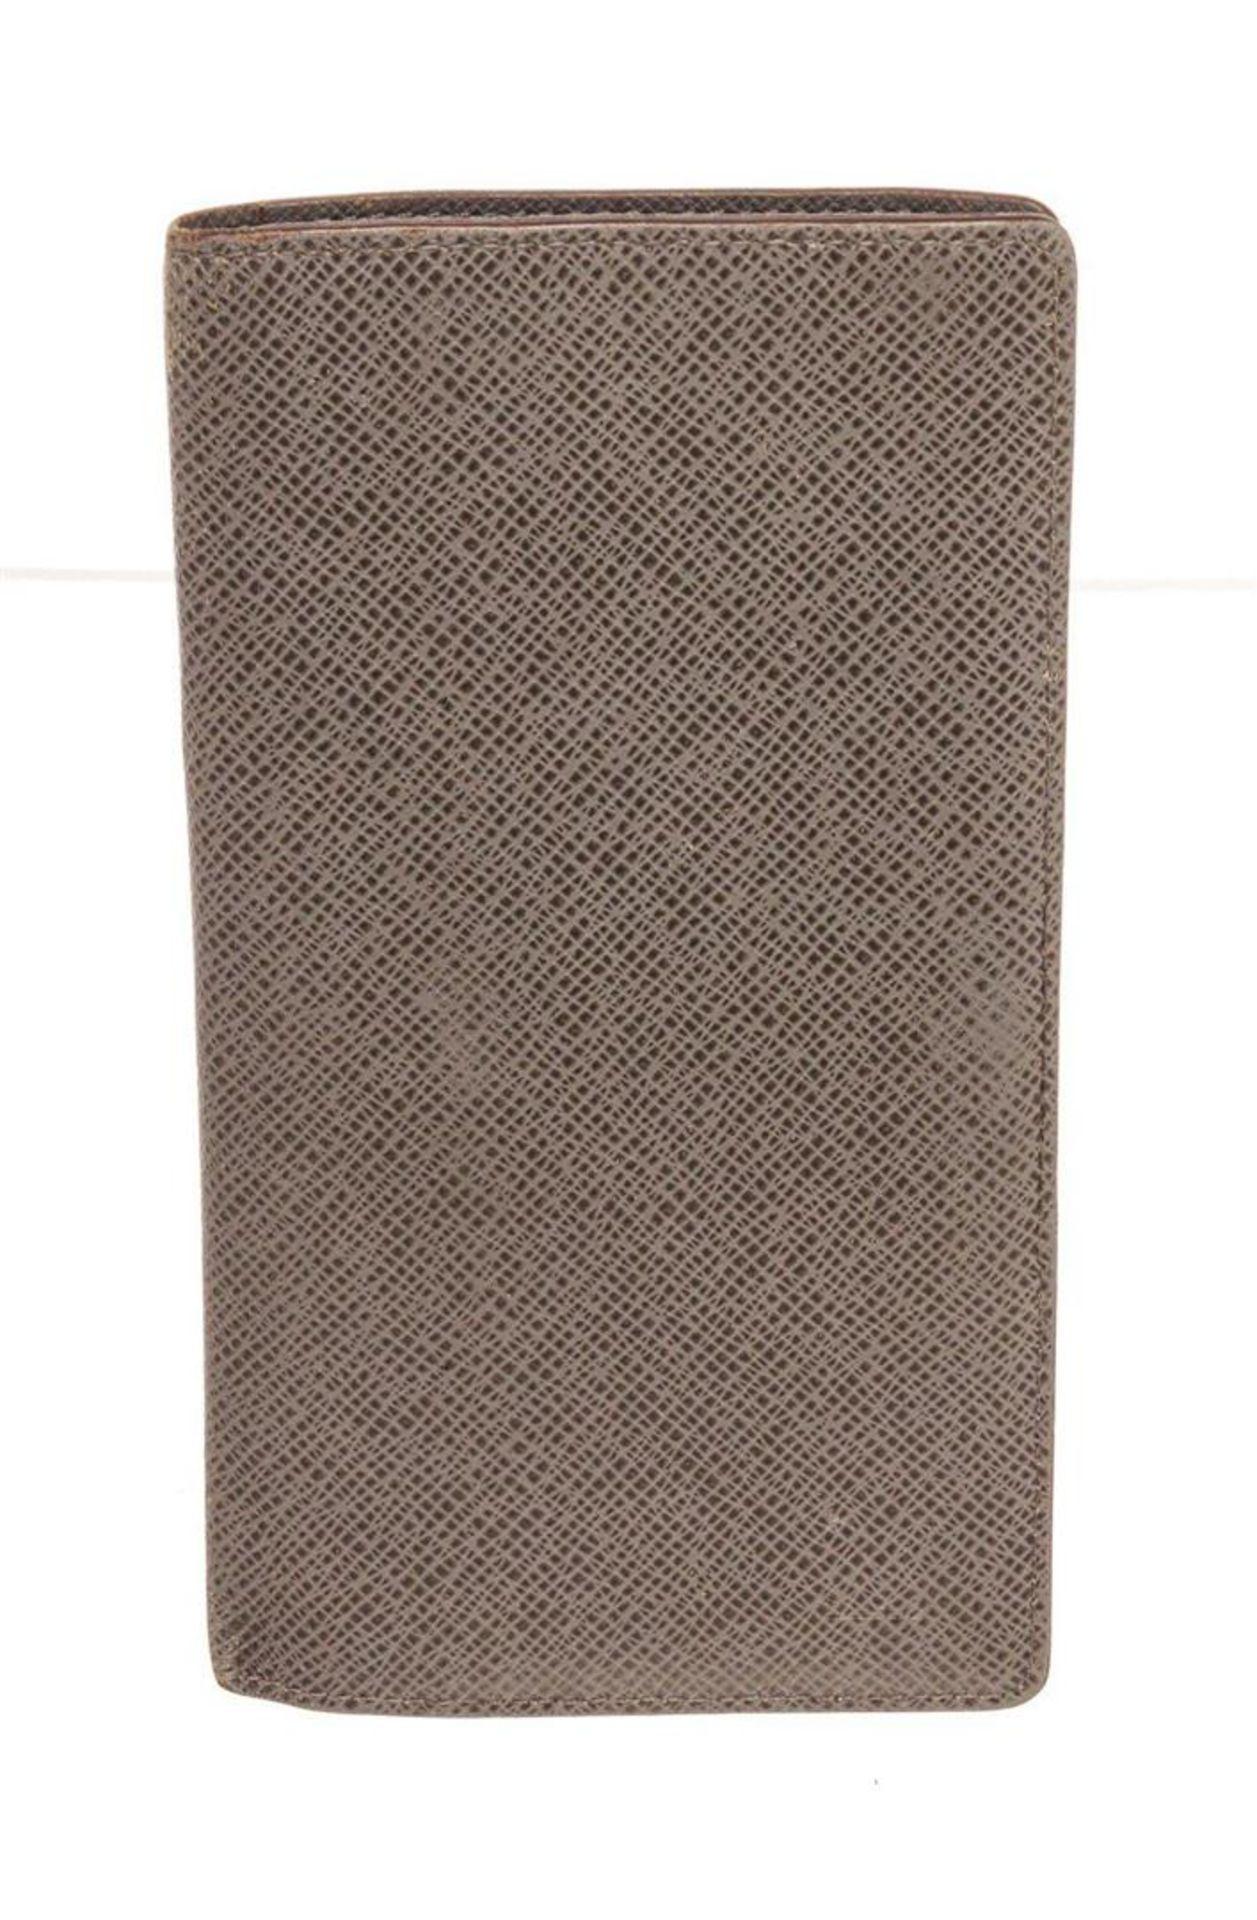 Louis Vuitton Brown Leather Canvas Long Card Wallet